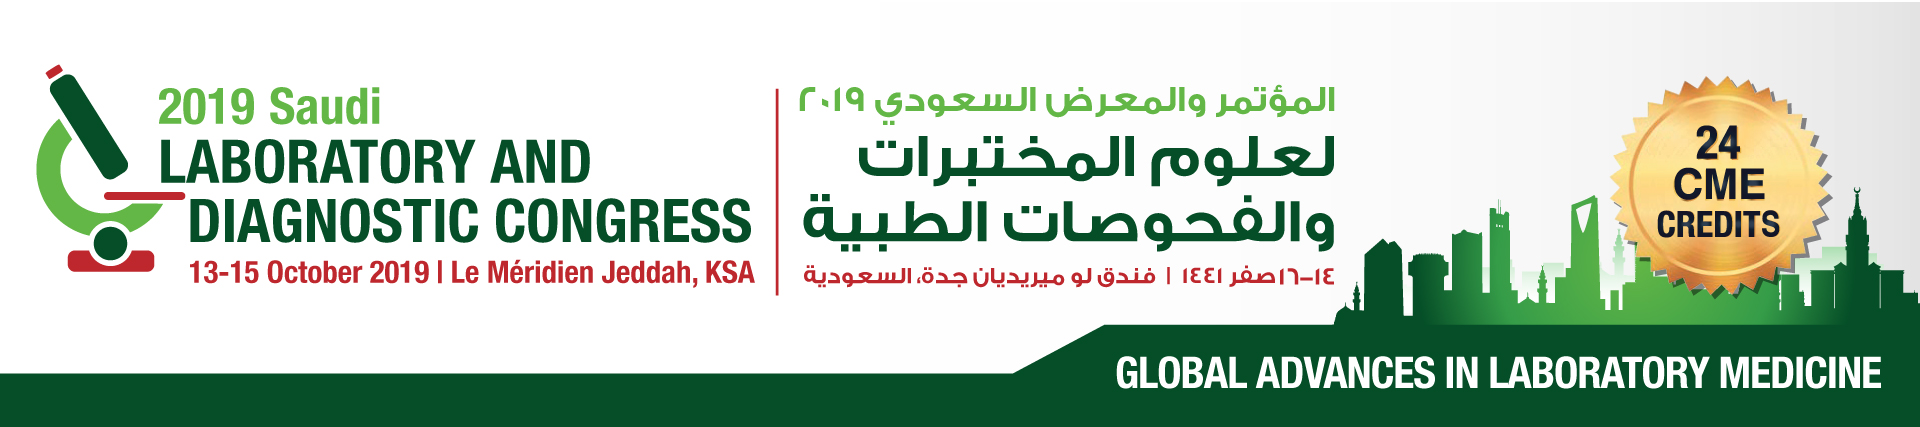 2019 Saudi Laboratory and Diagnostics Congress Abstract